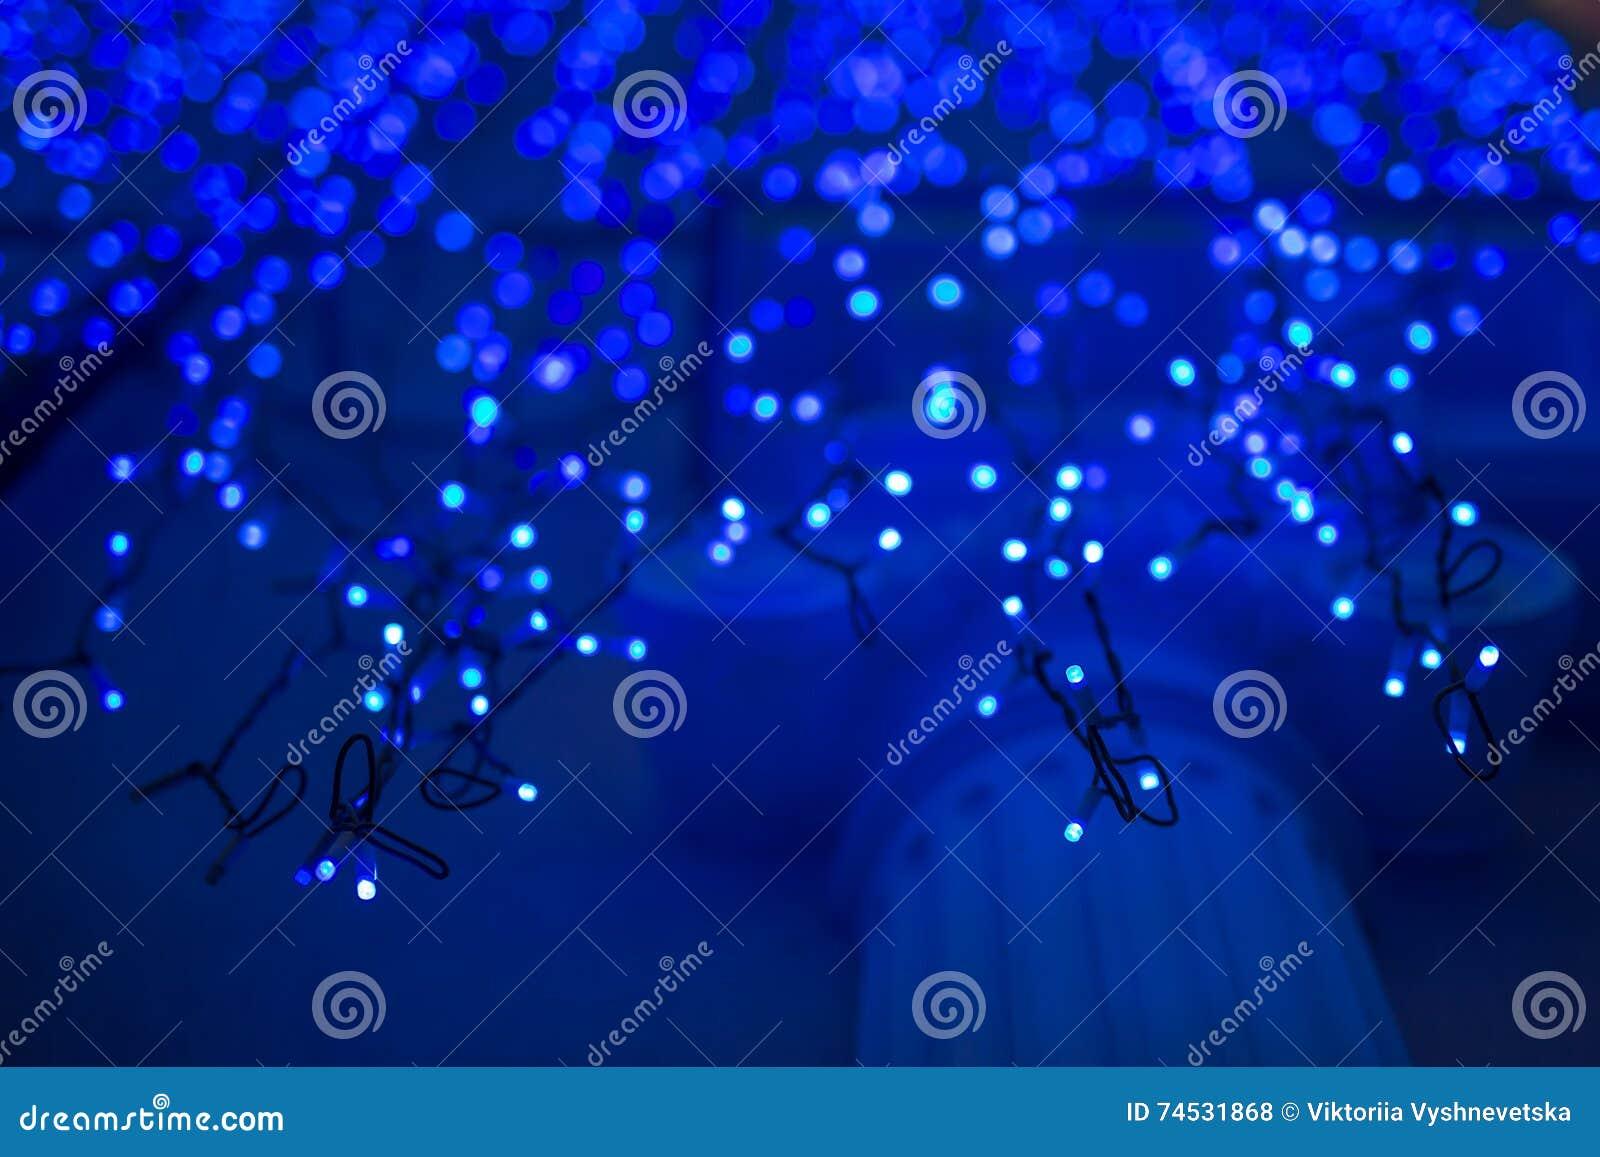 Christmas Lights On Dark Blue Background Royalty Free